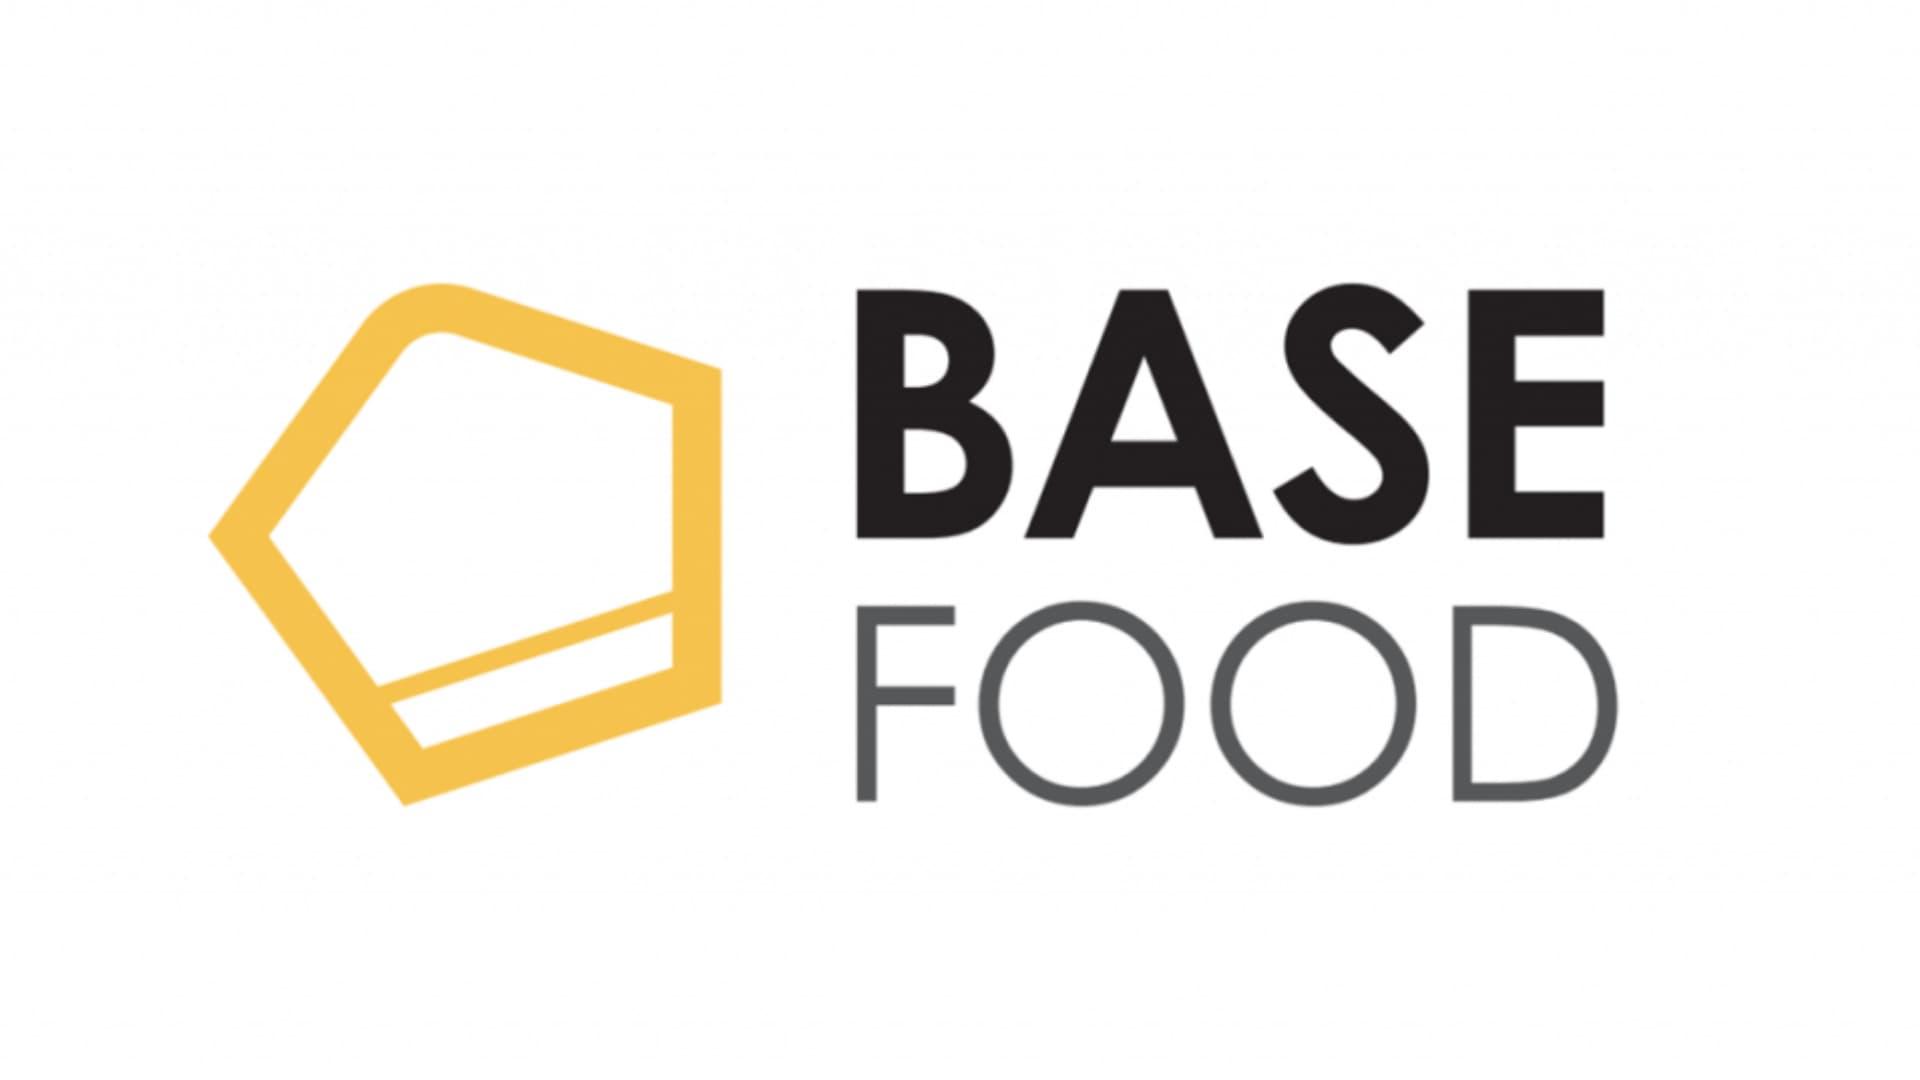 BASE FOOD株式会社 ロゴ